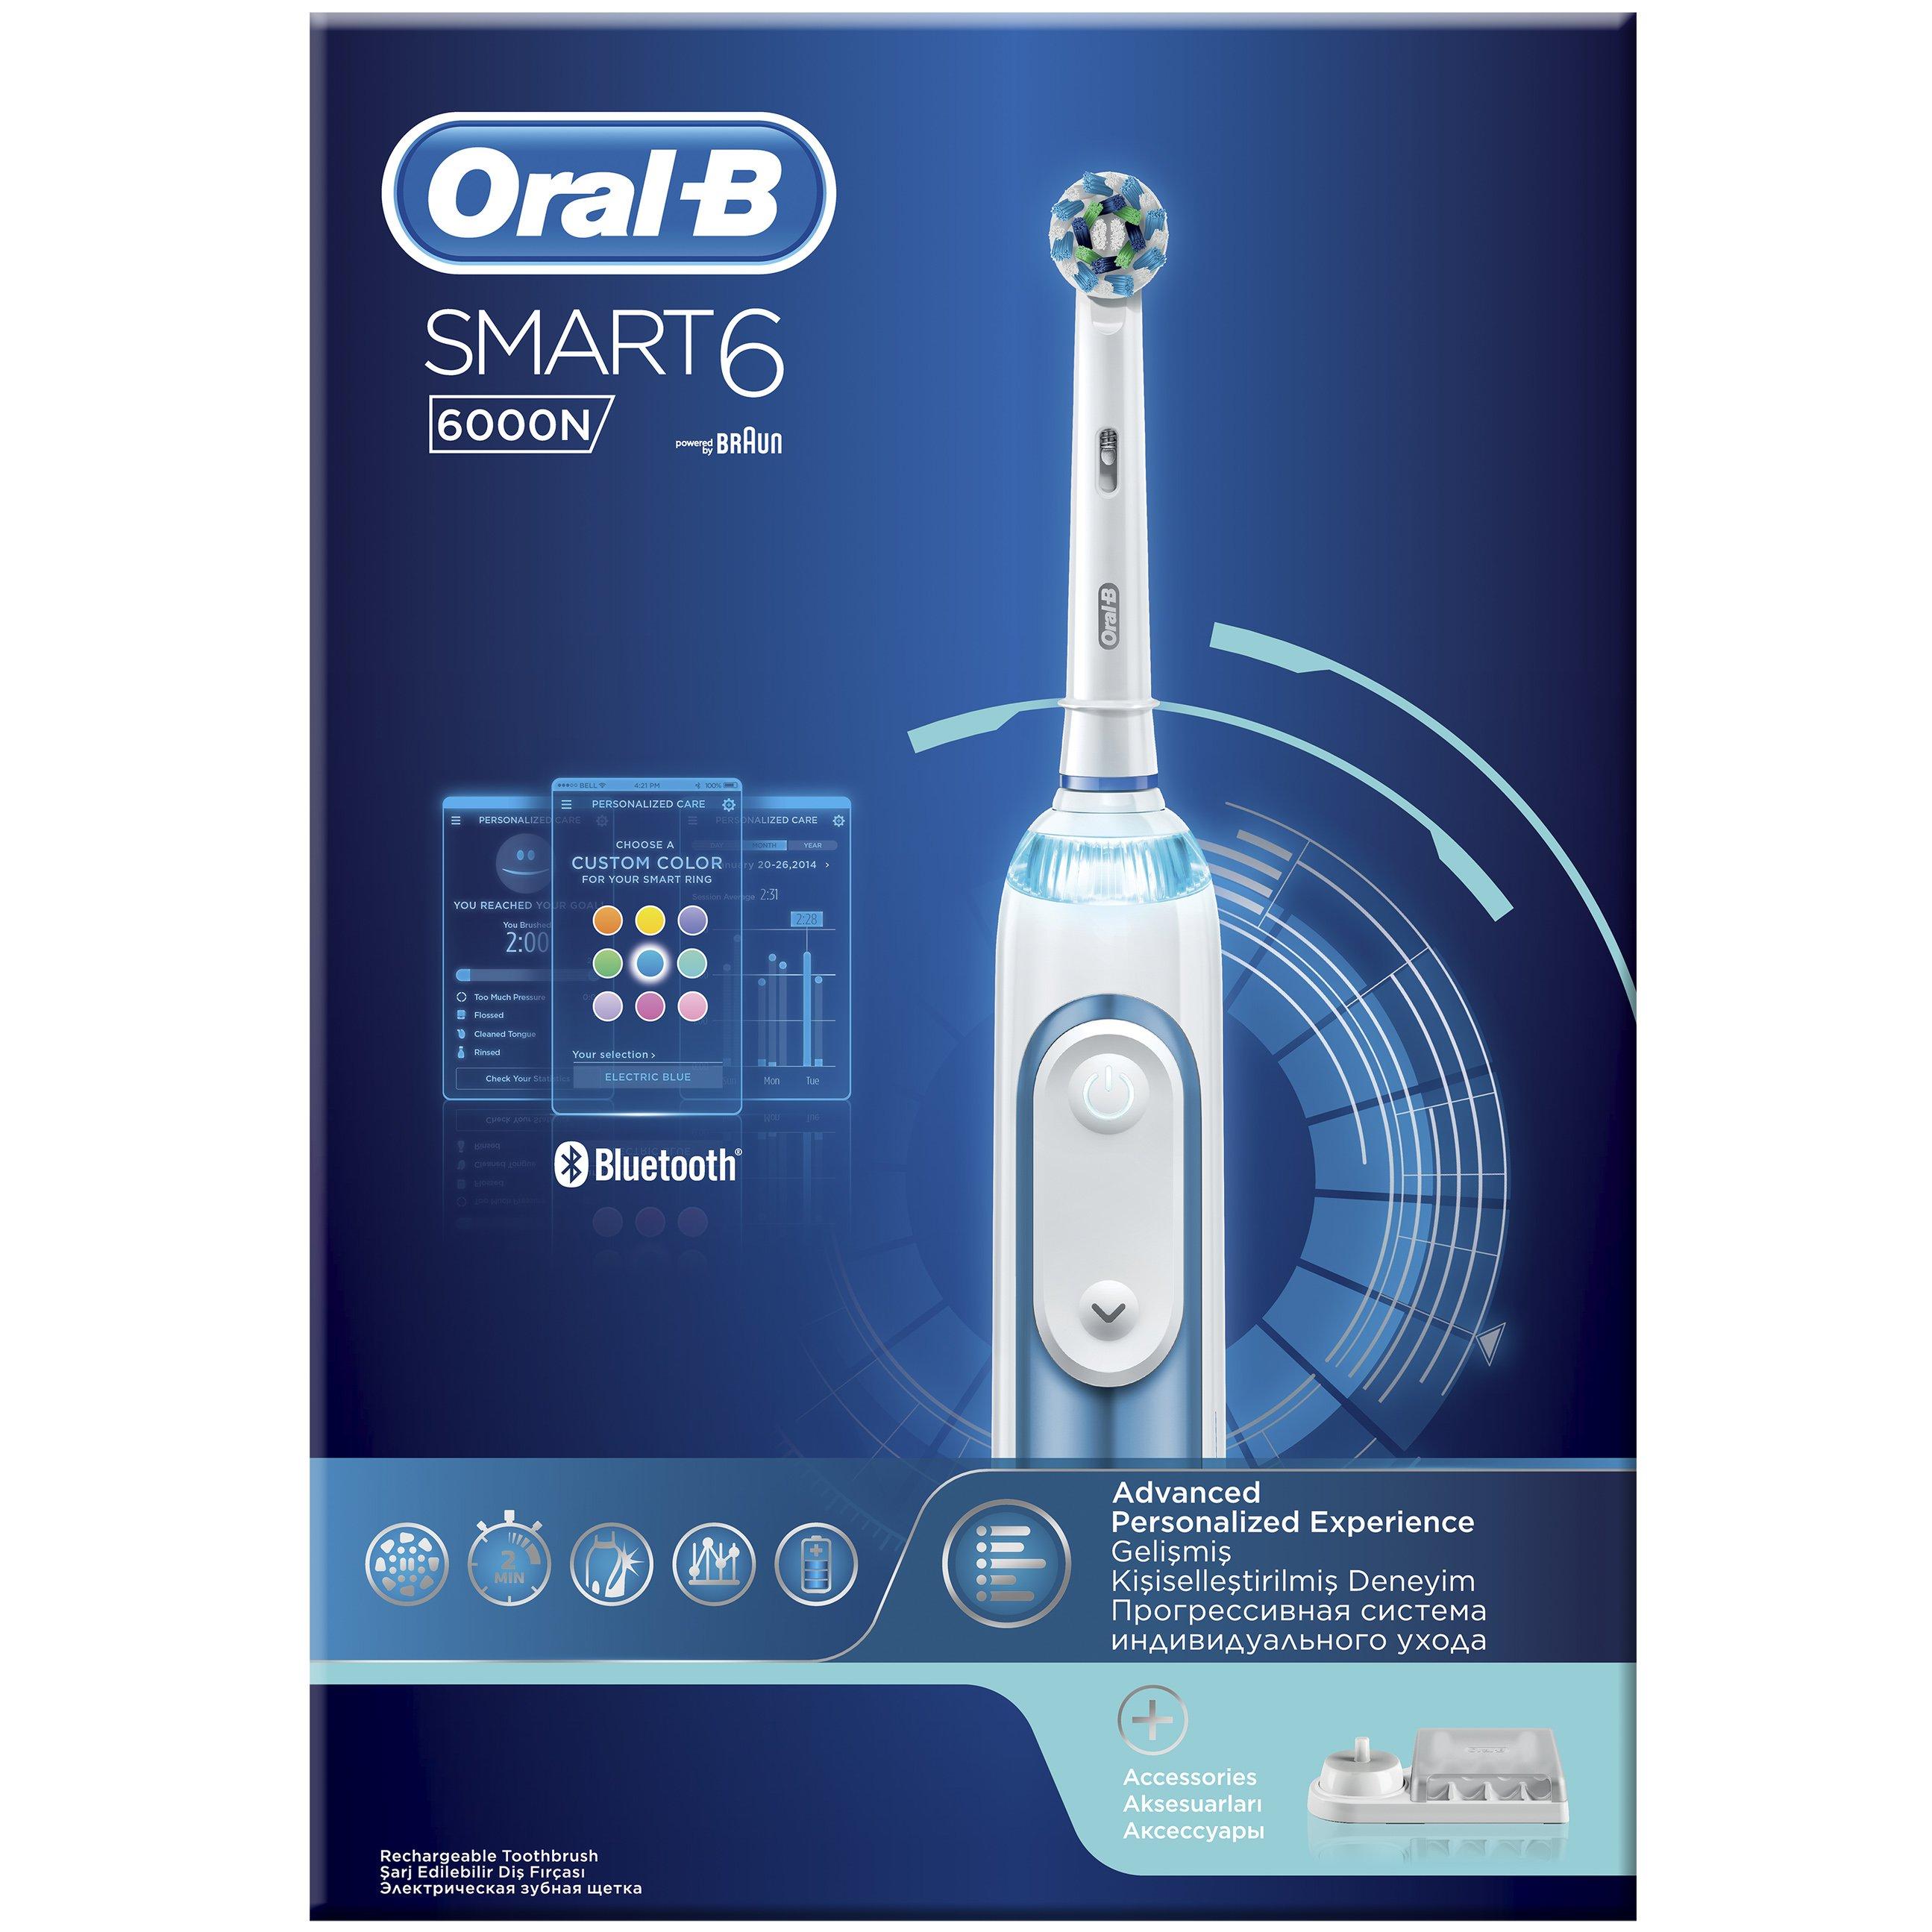 Oral-B Smart 6 6000 N Ηλεκτρική Οδοντόβουρτσα με Προηγμένες Λειτουργίες & Λειτουργία Bluetooth για Σύνδεση με το Smartphone